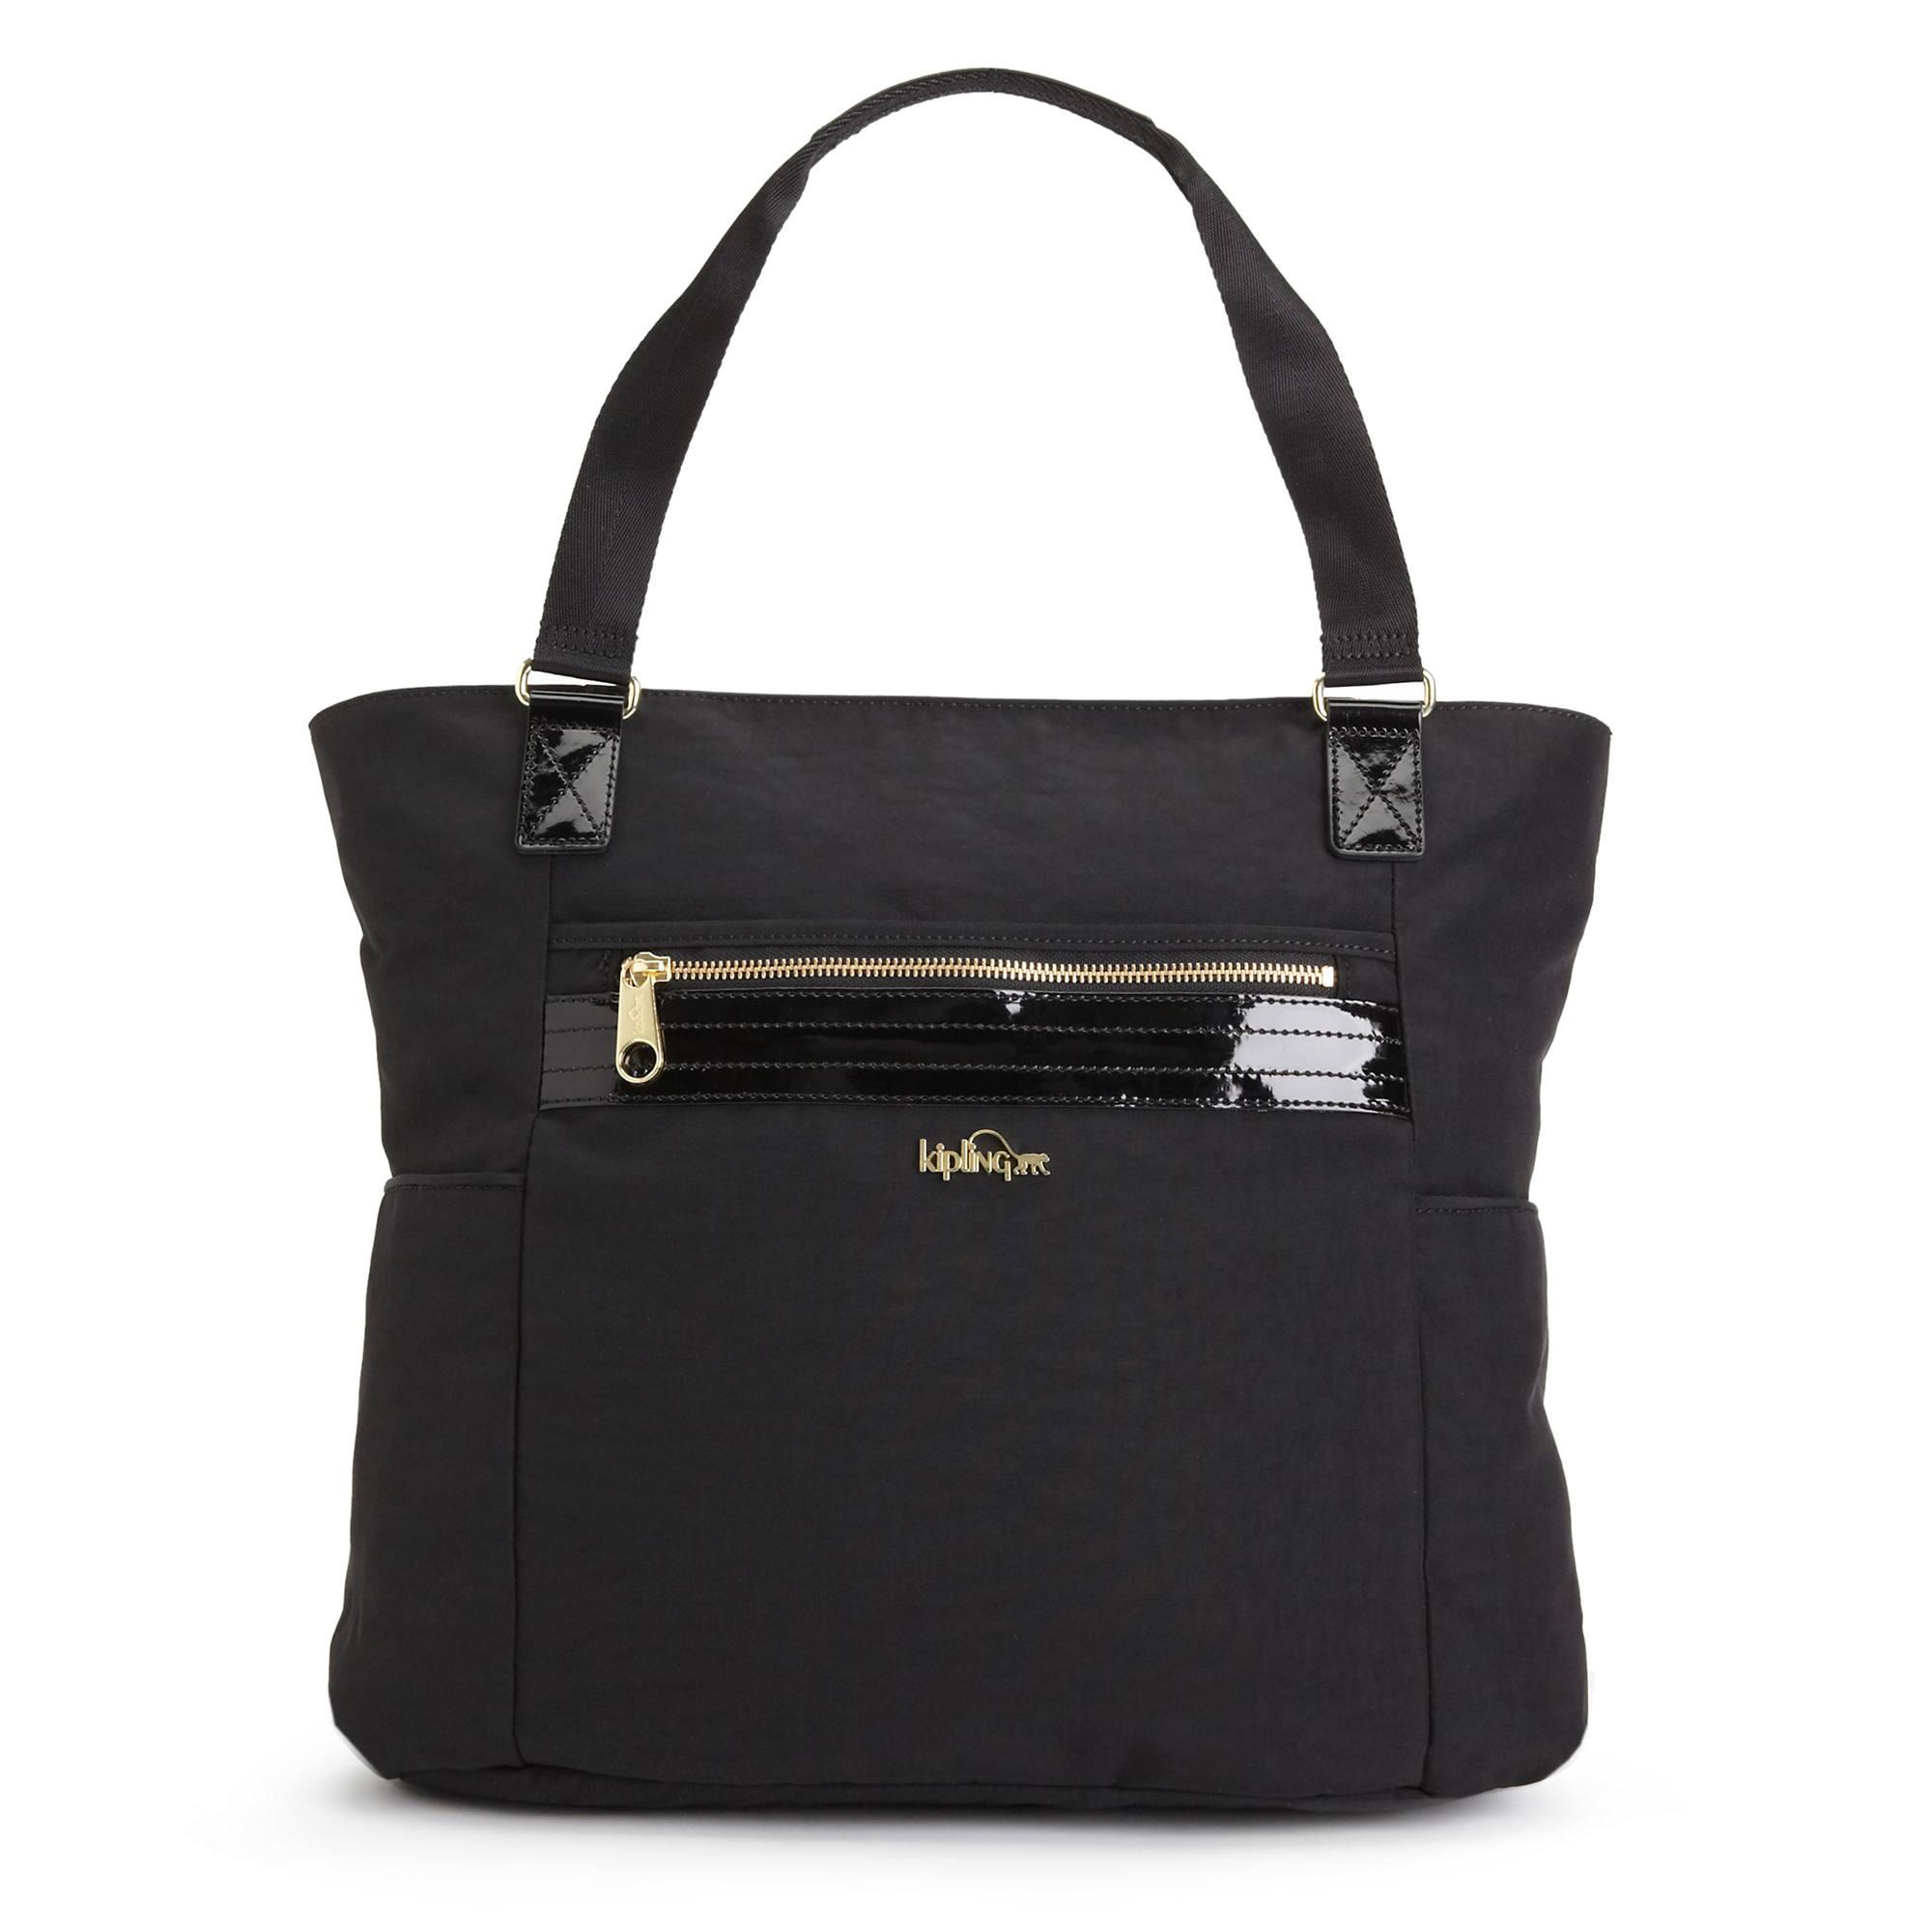 Leah Tote Bag Black Patent Combo Large